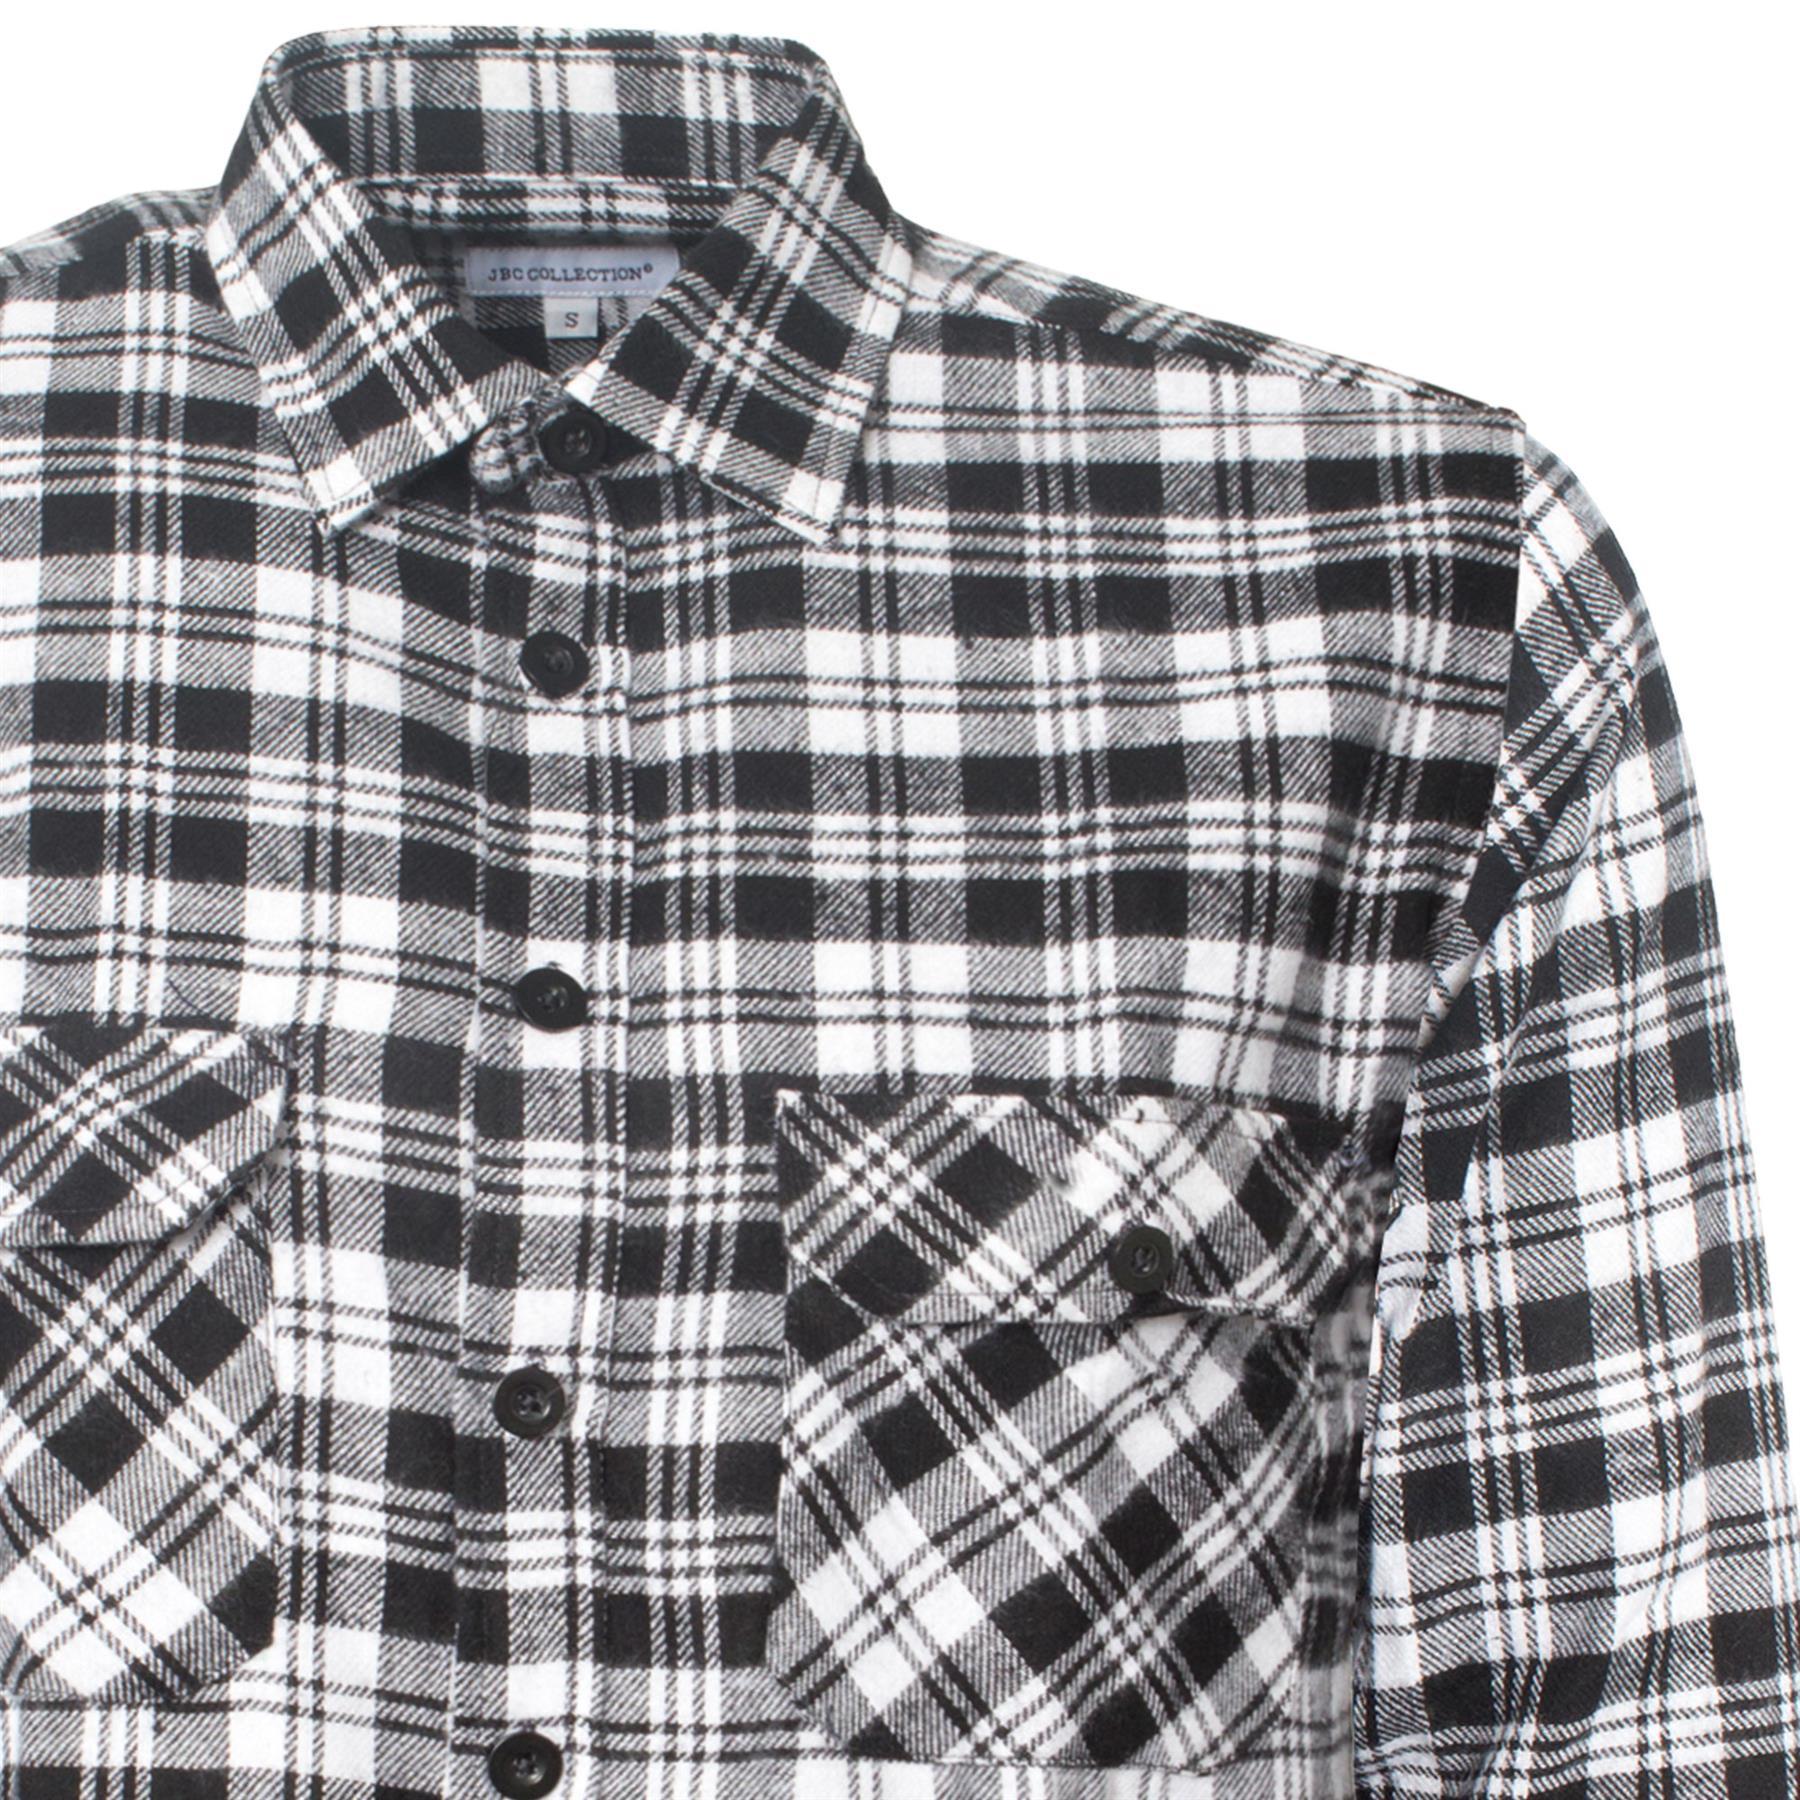 TB Ropa Hombre Camisas De Trabajo De Algod/ón Cepillado Lumberjack Franela De Manga Larga Check Camisa Tejido Material Libre P /& P